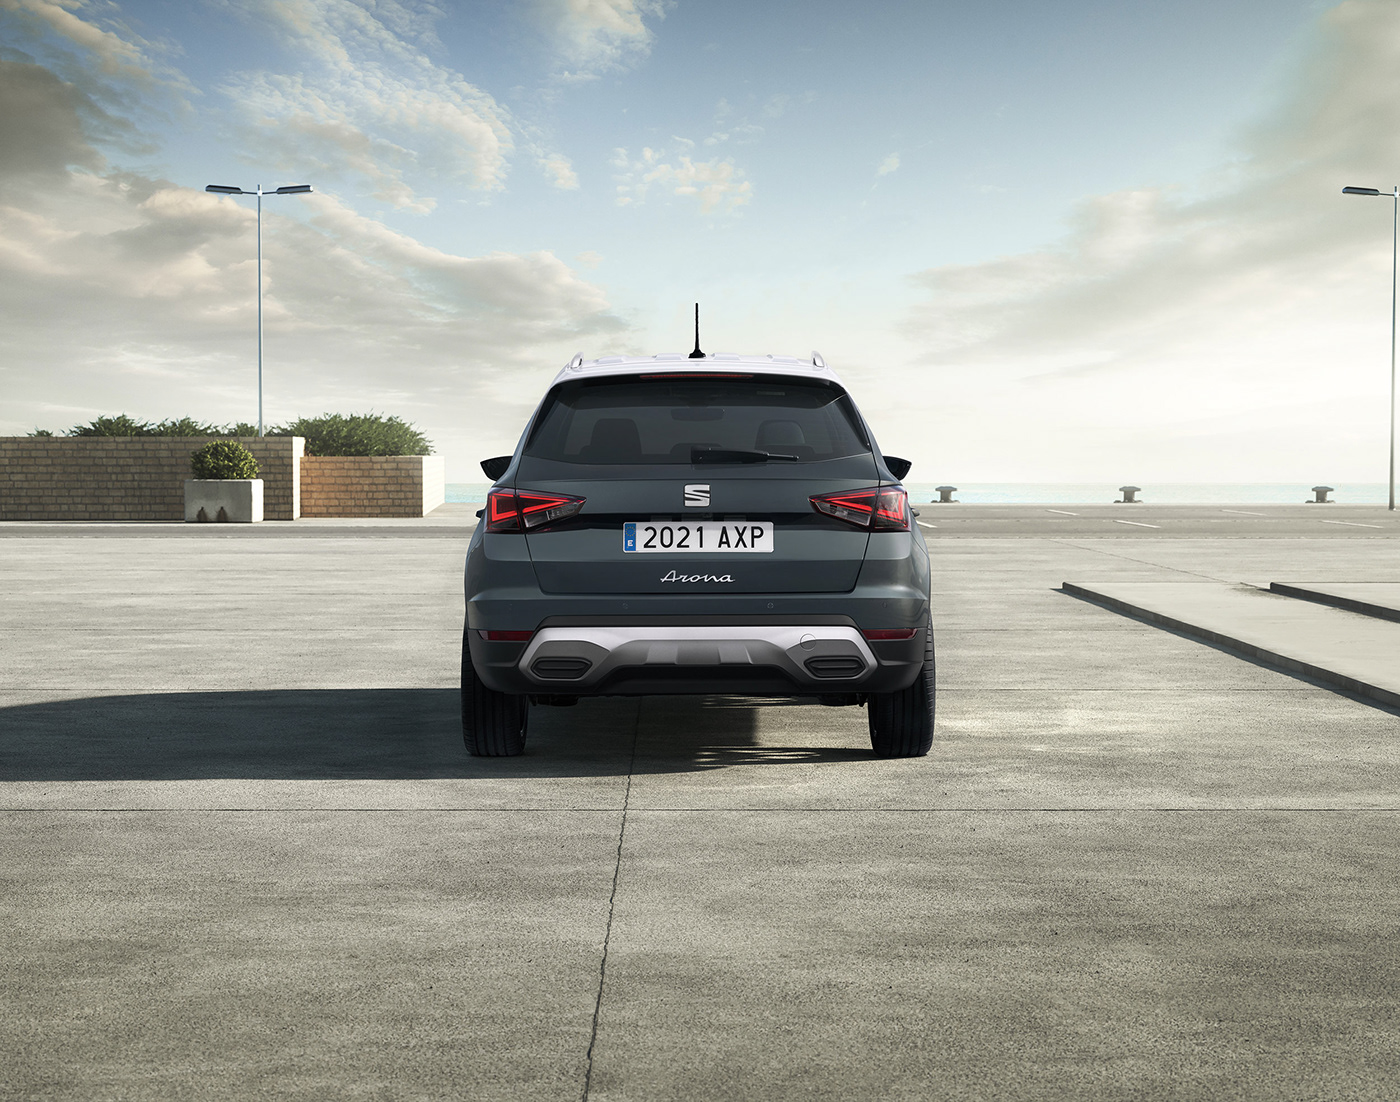 arona,automotive  ,barcelona,CGI,ibiza,new,photo,retouch,seat